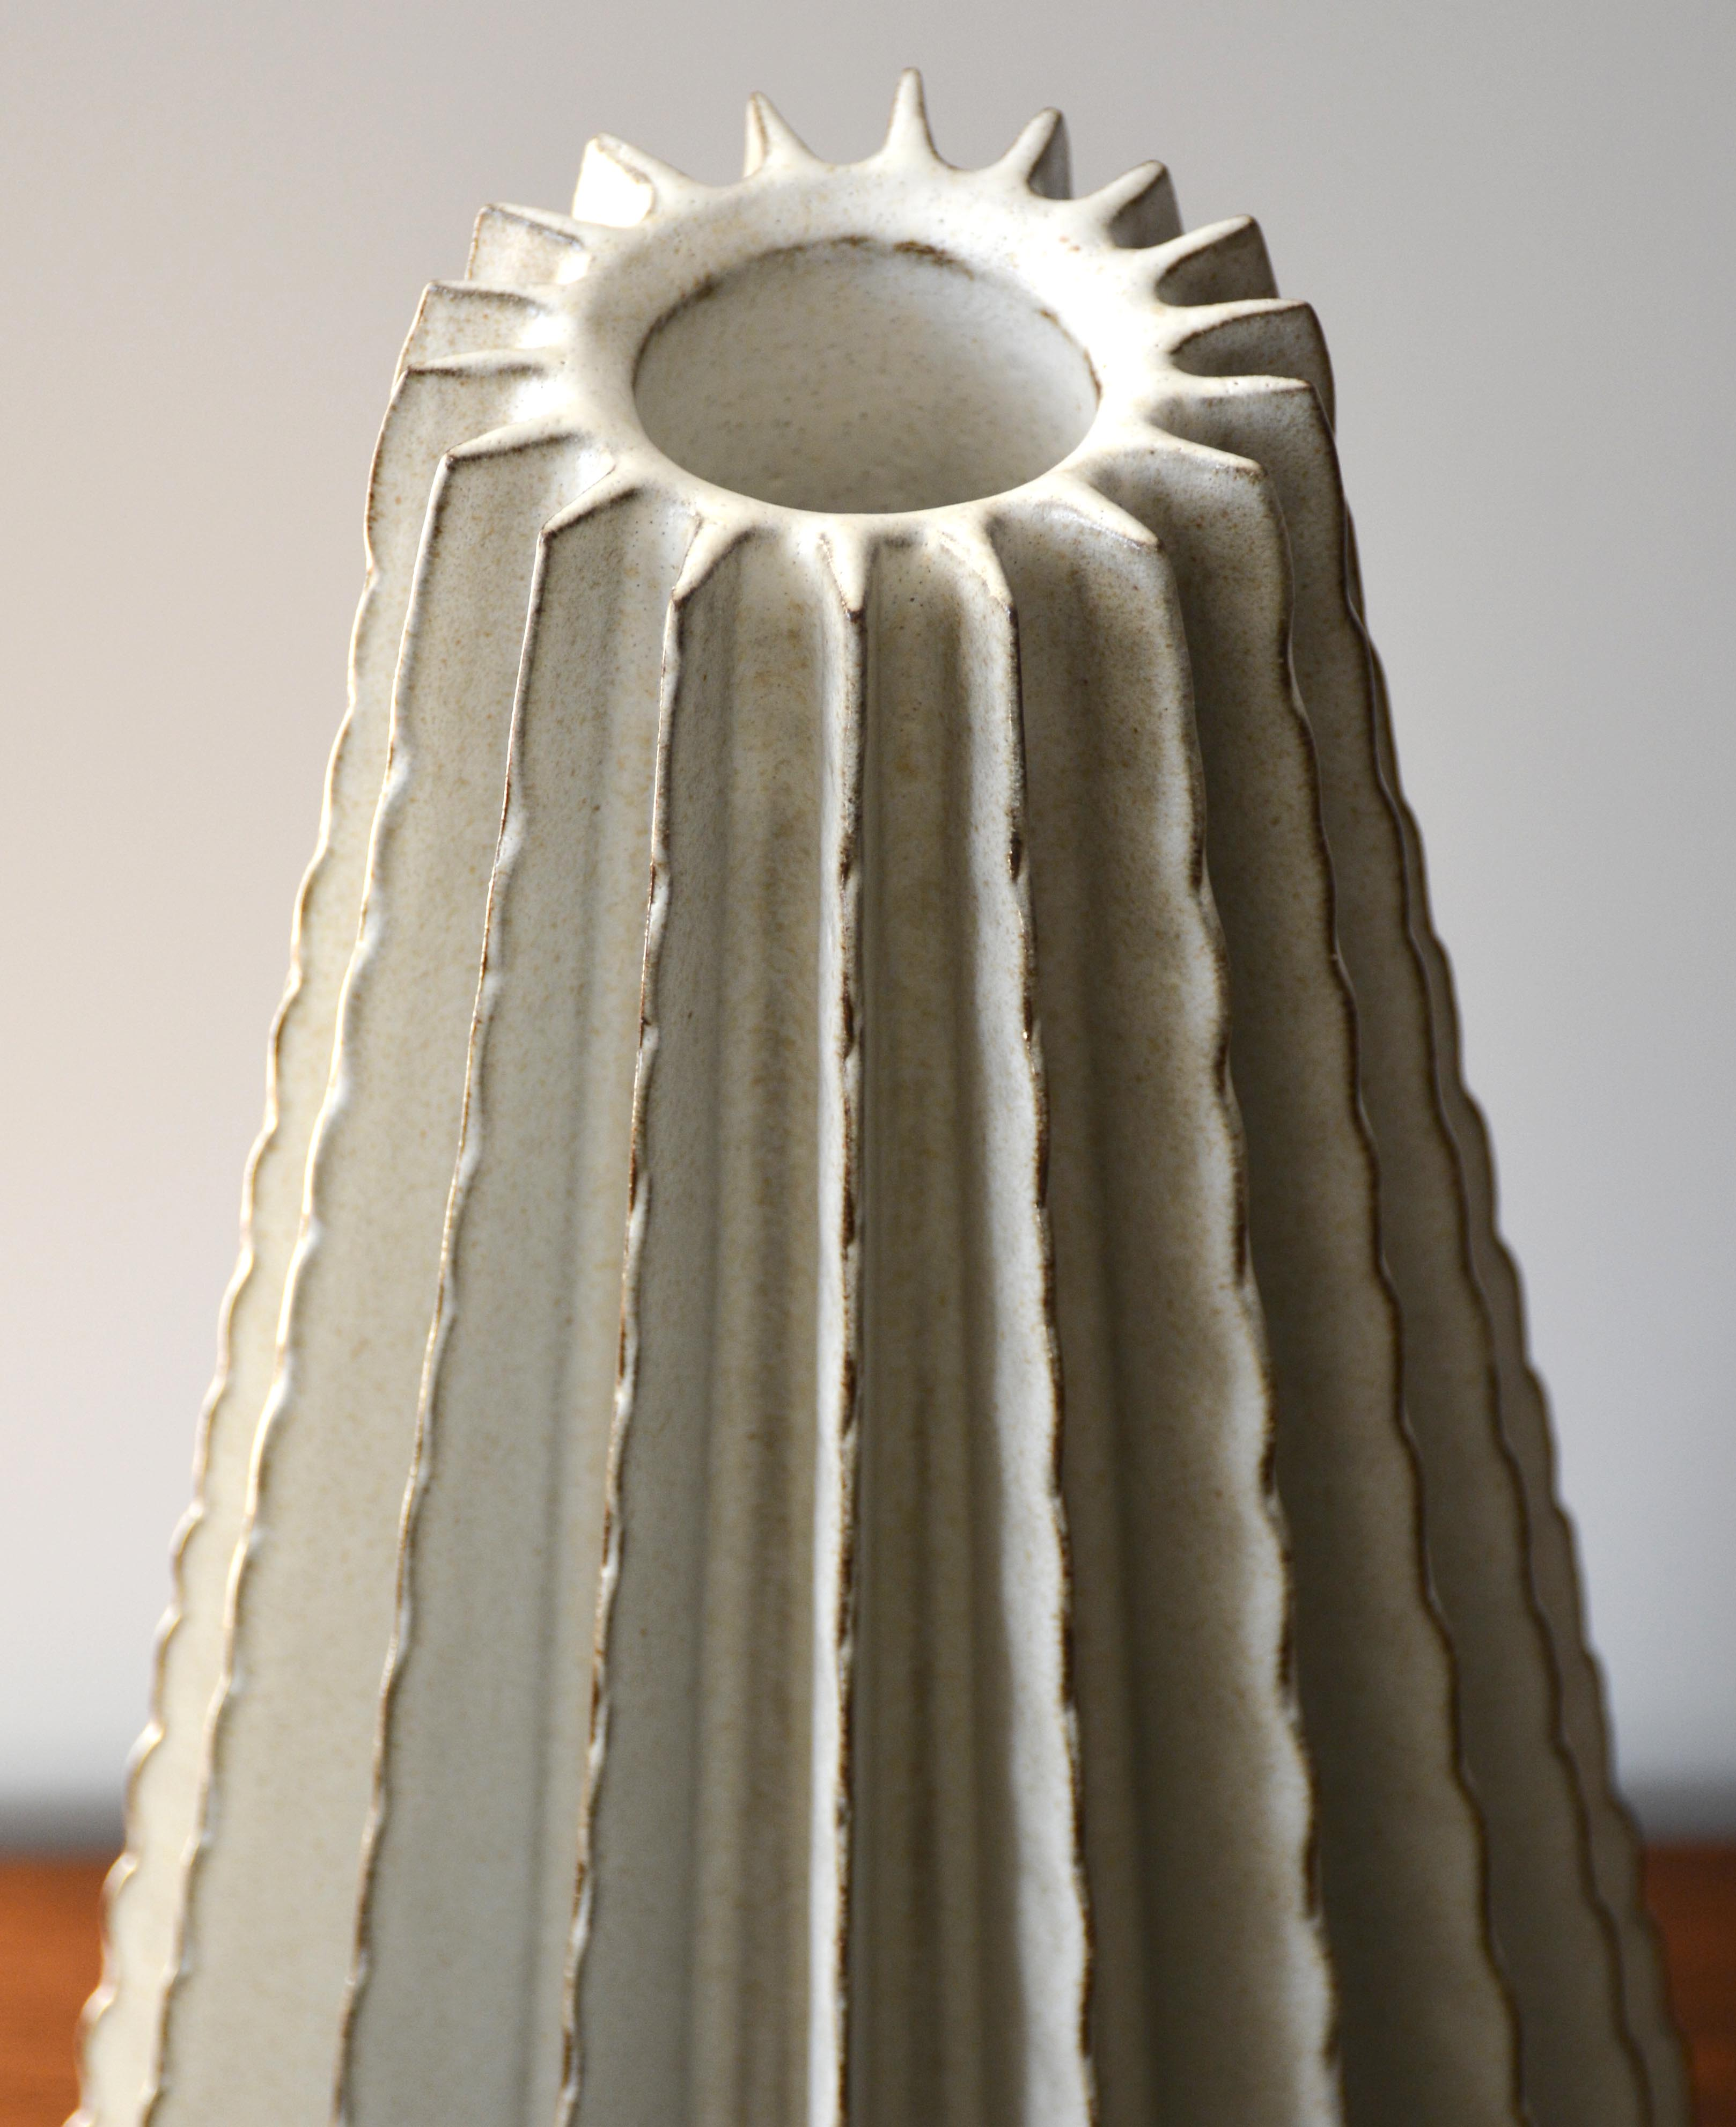 Cone Detail (0615)